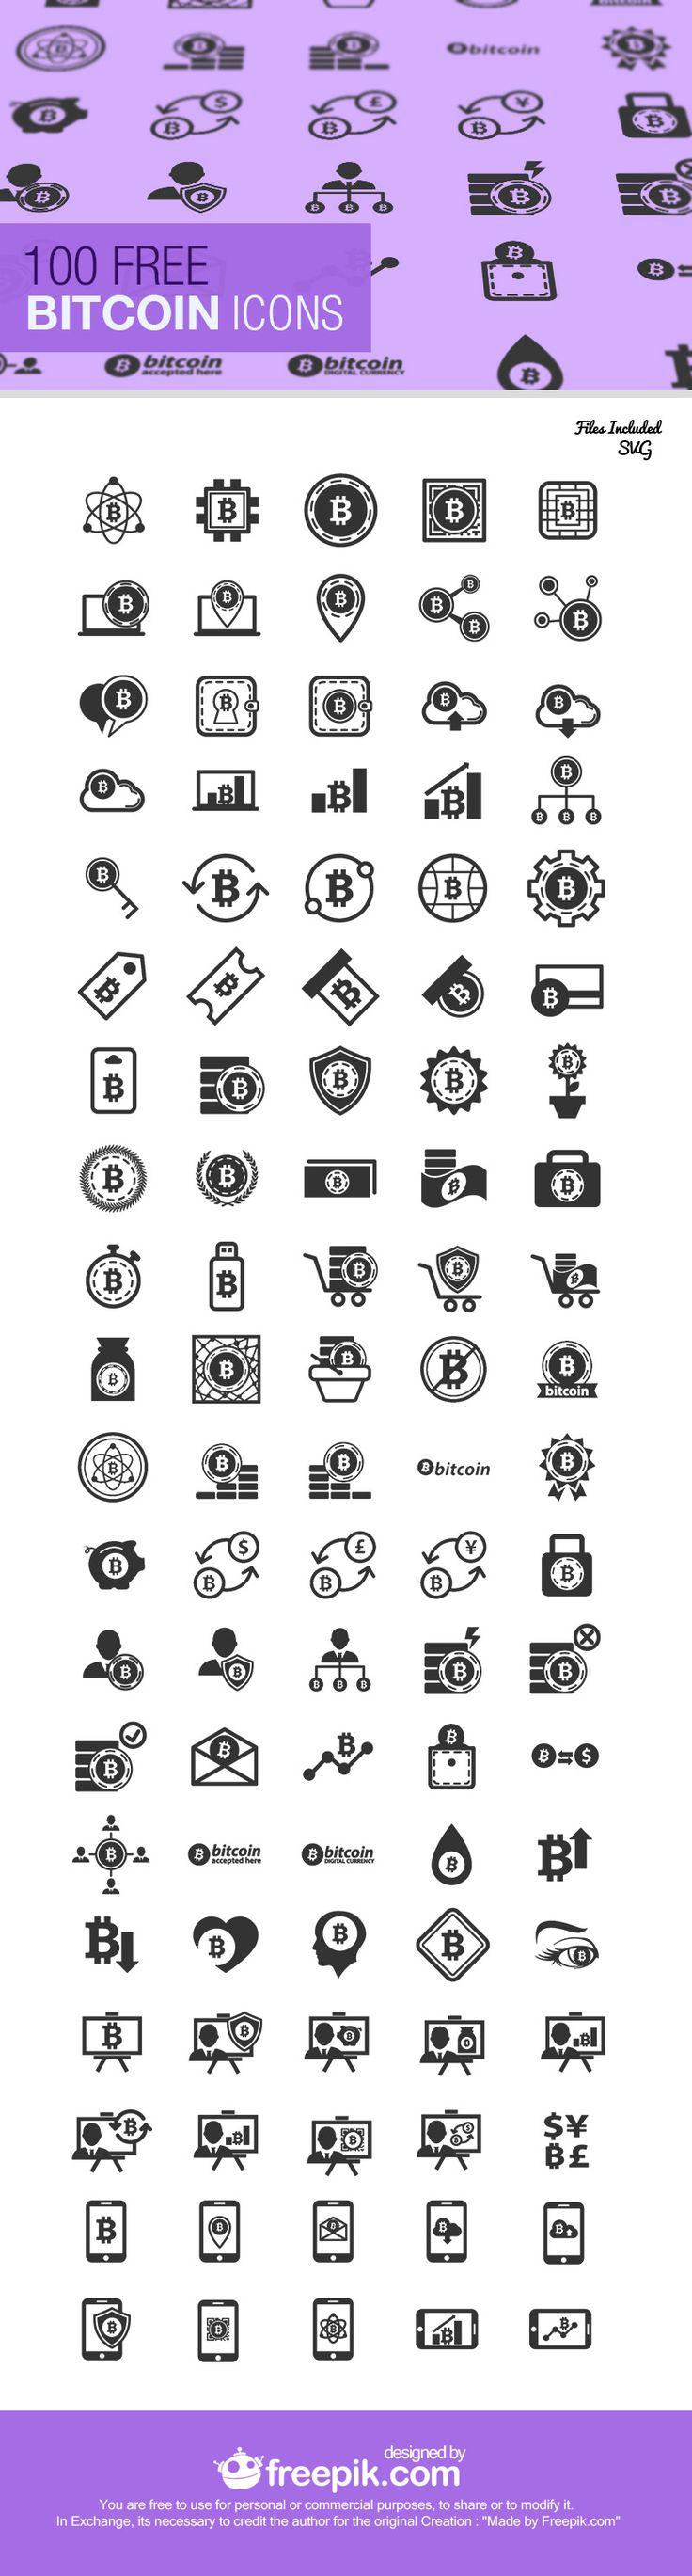 Freebie: The Bitcoin Icon Set (100 Icons, SVG